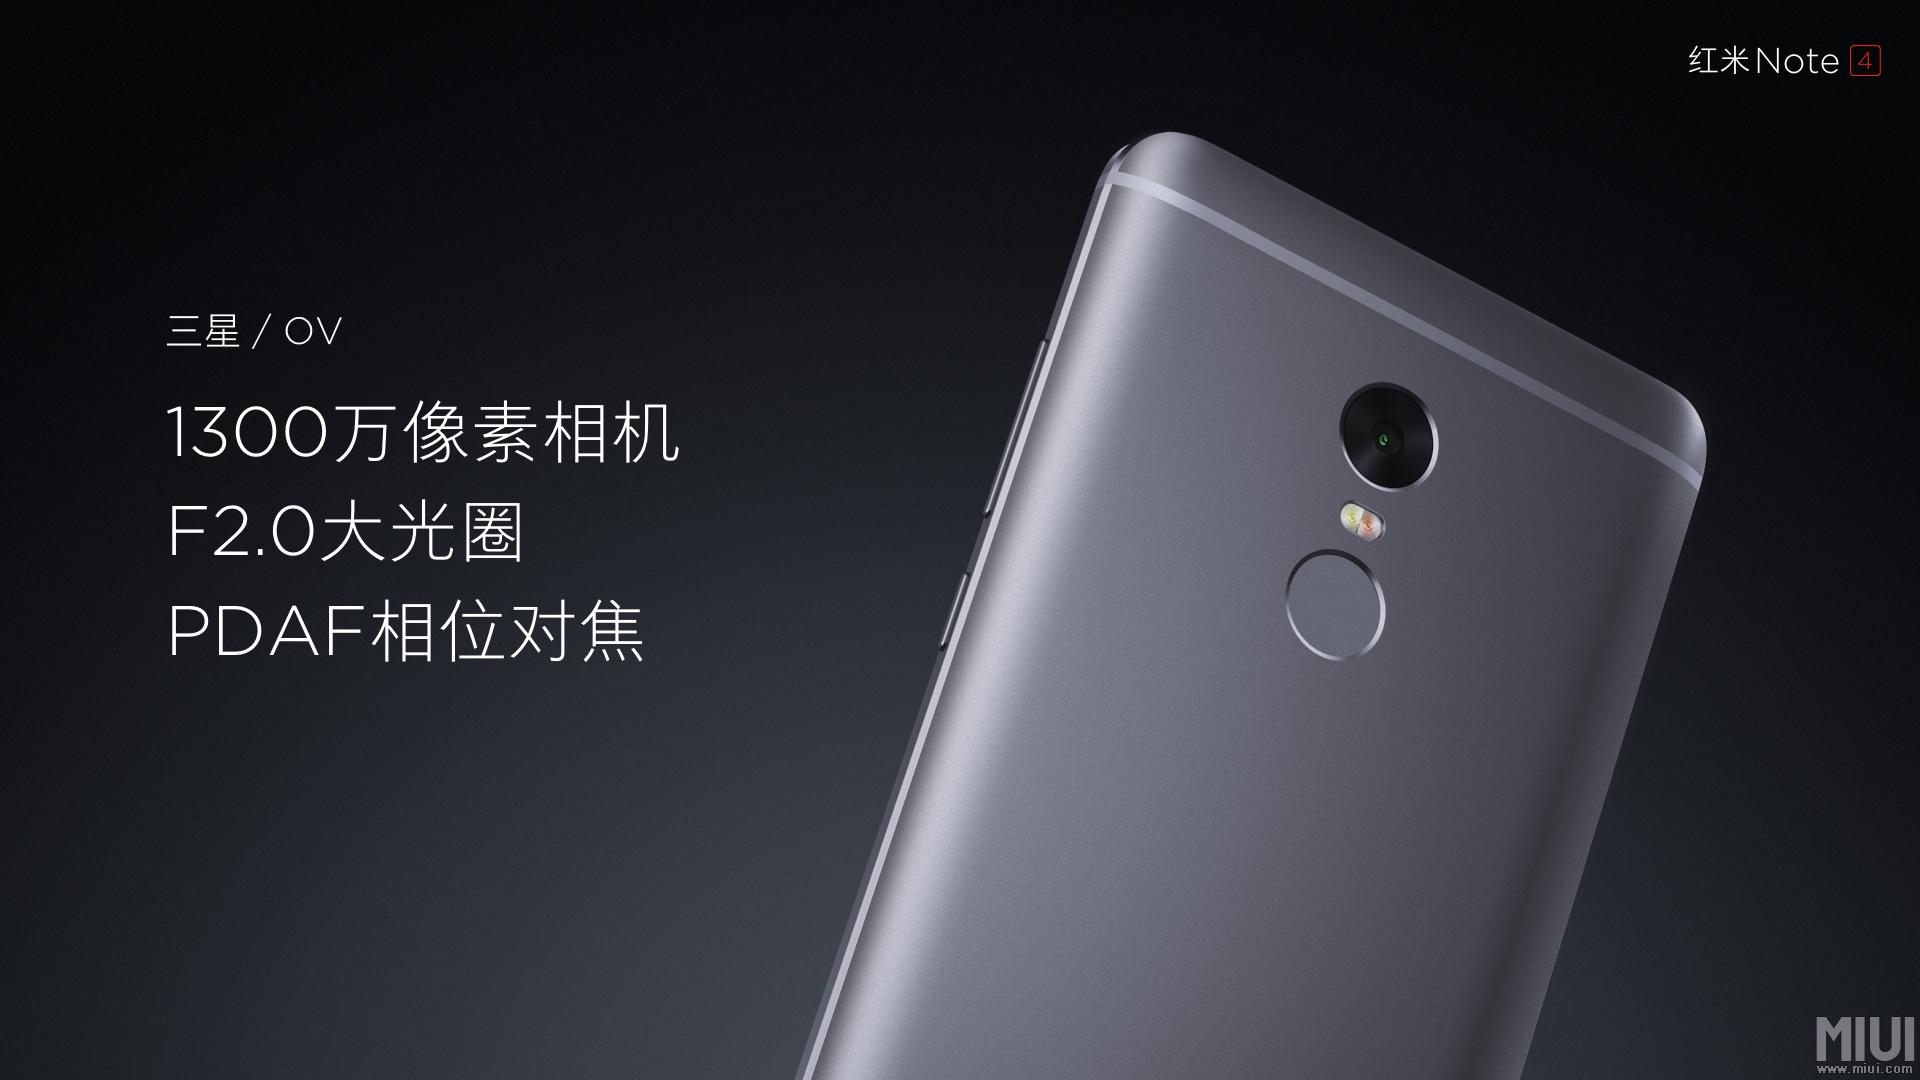 Xiaomi Launches Redmi Note 4 in China